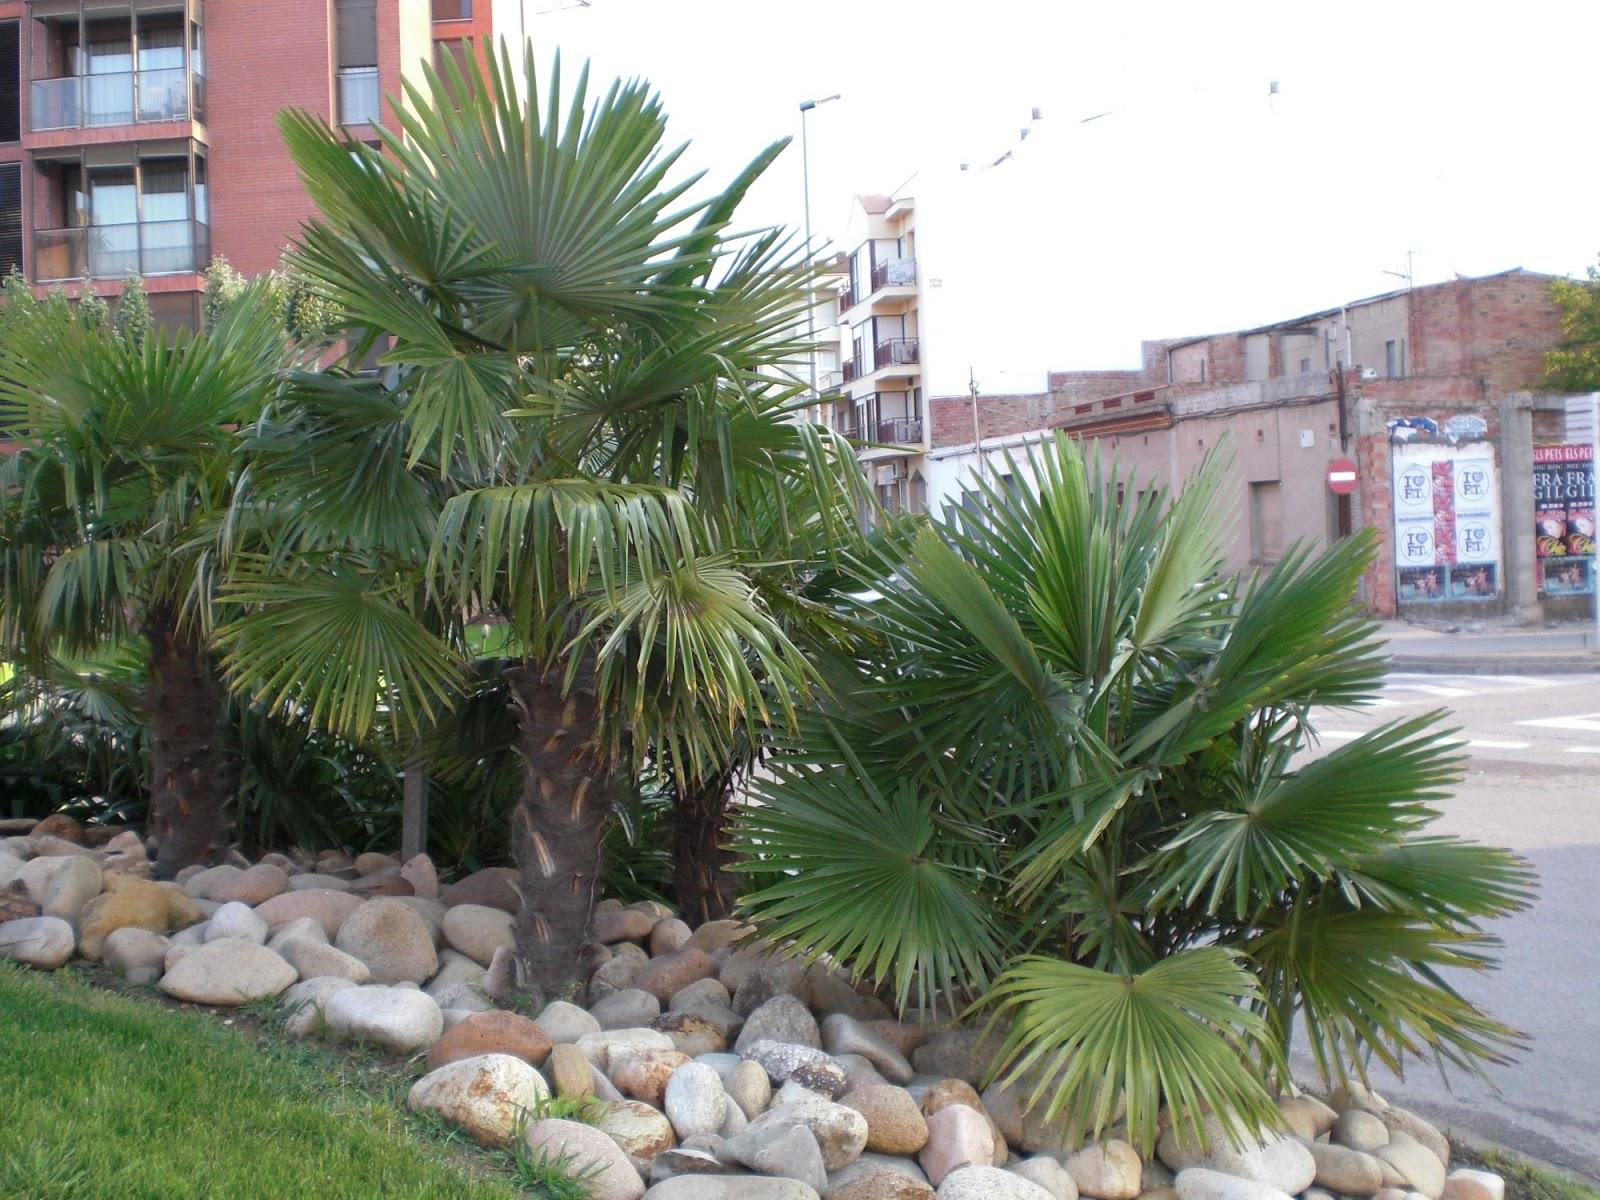 Palmeras de jardin imagui for Diseno jardines